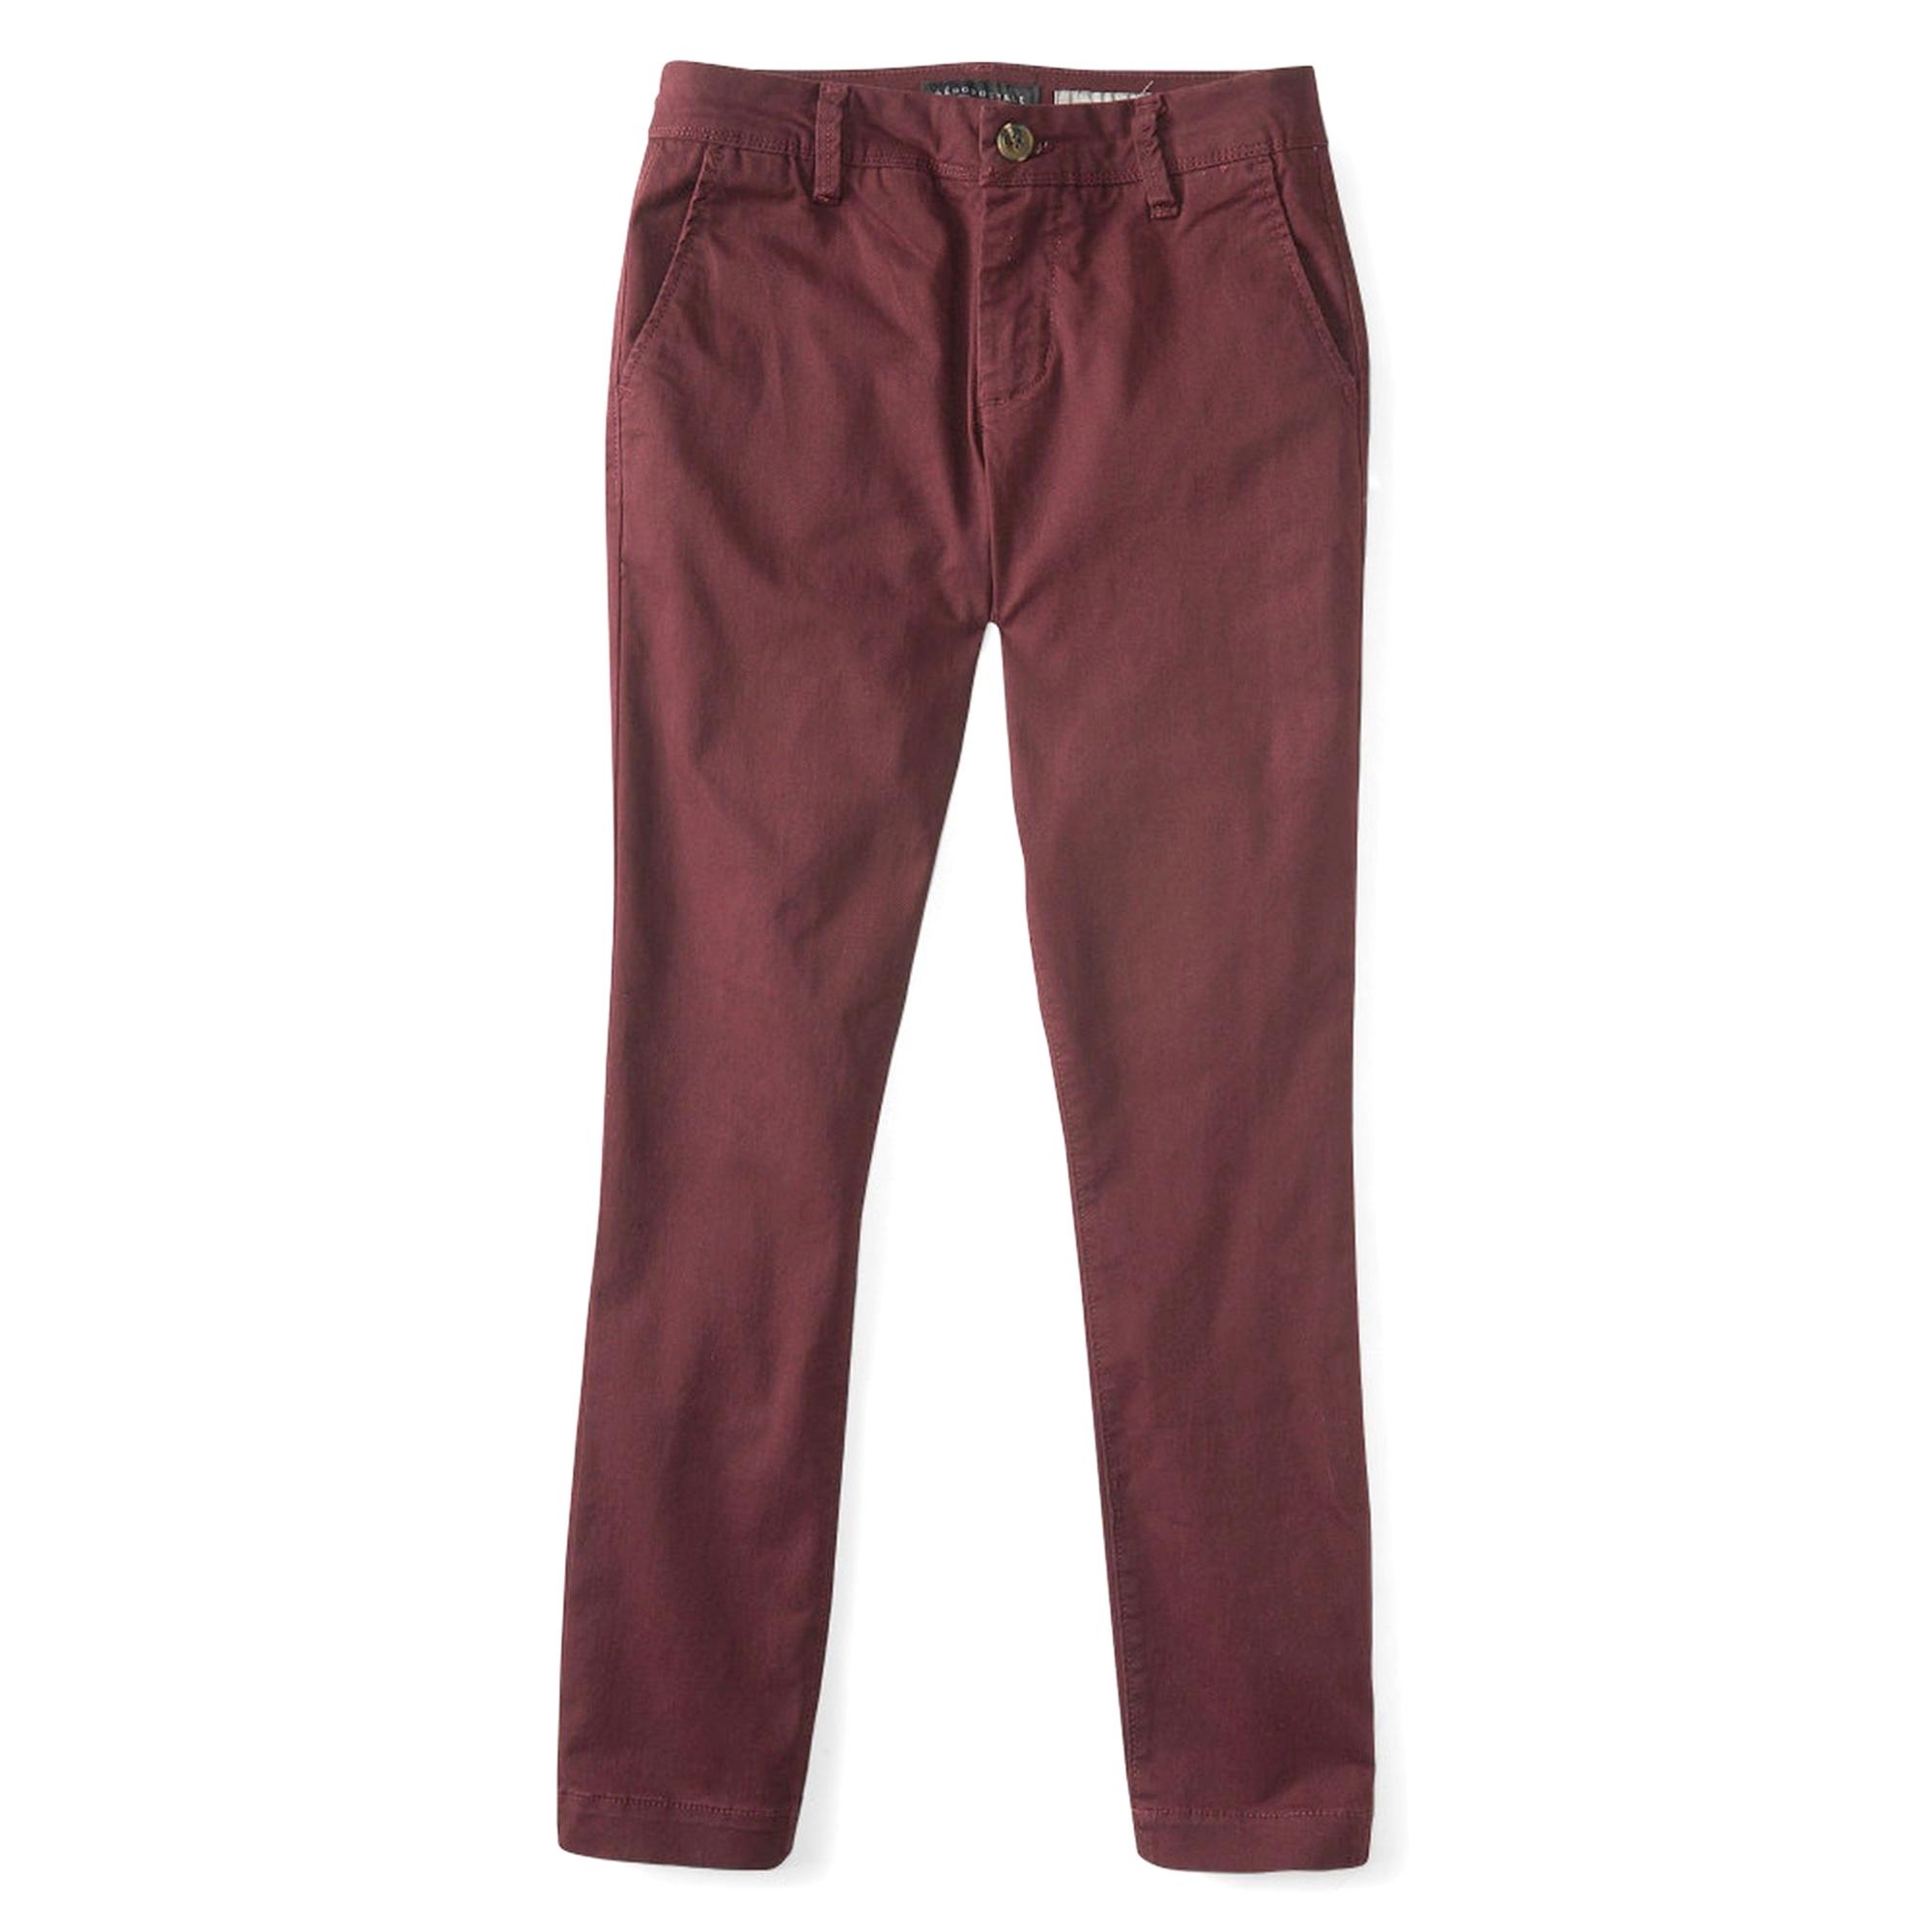 Aeropostale Mens Reflex Casual Chino Pants